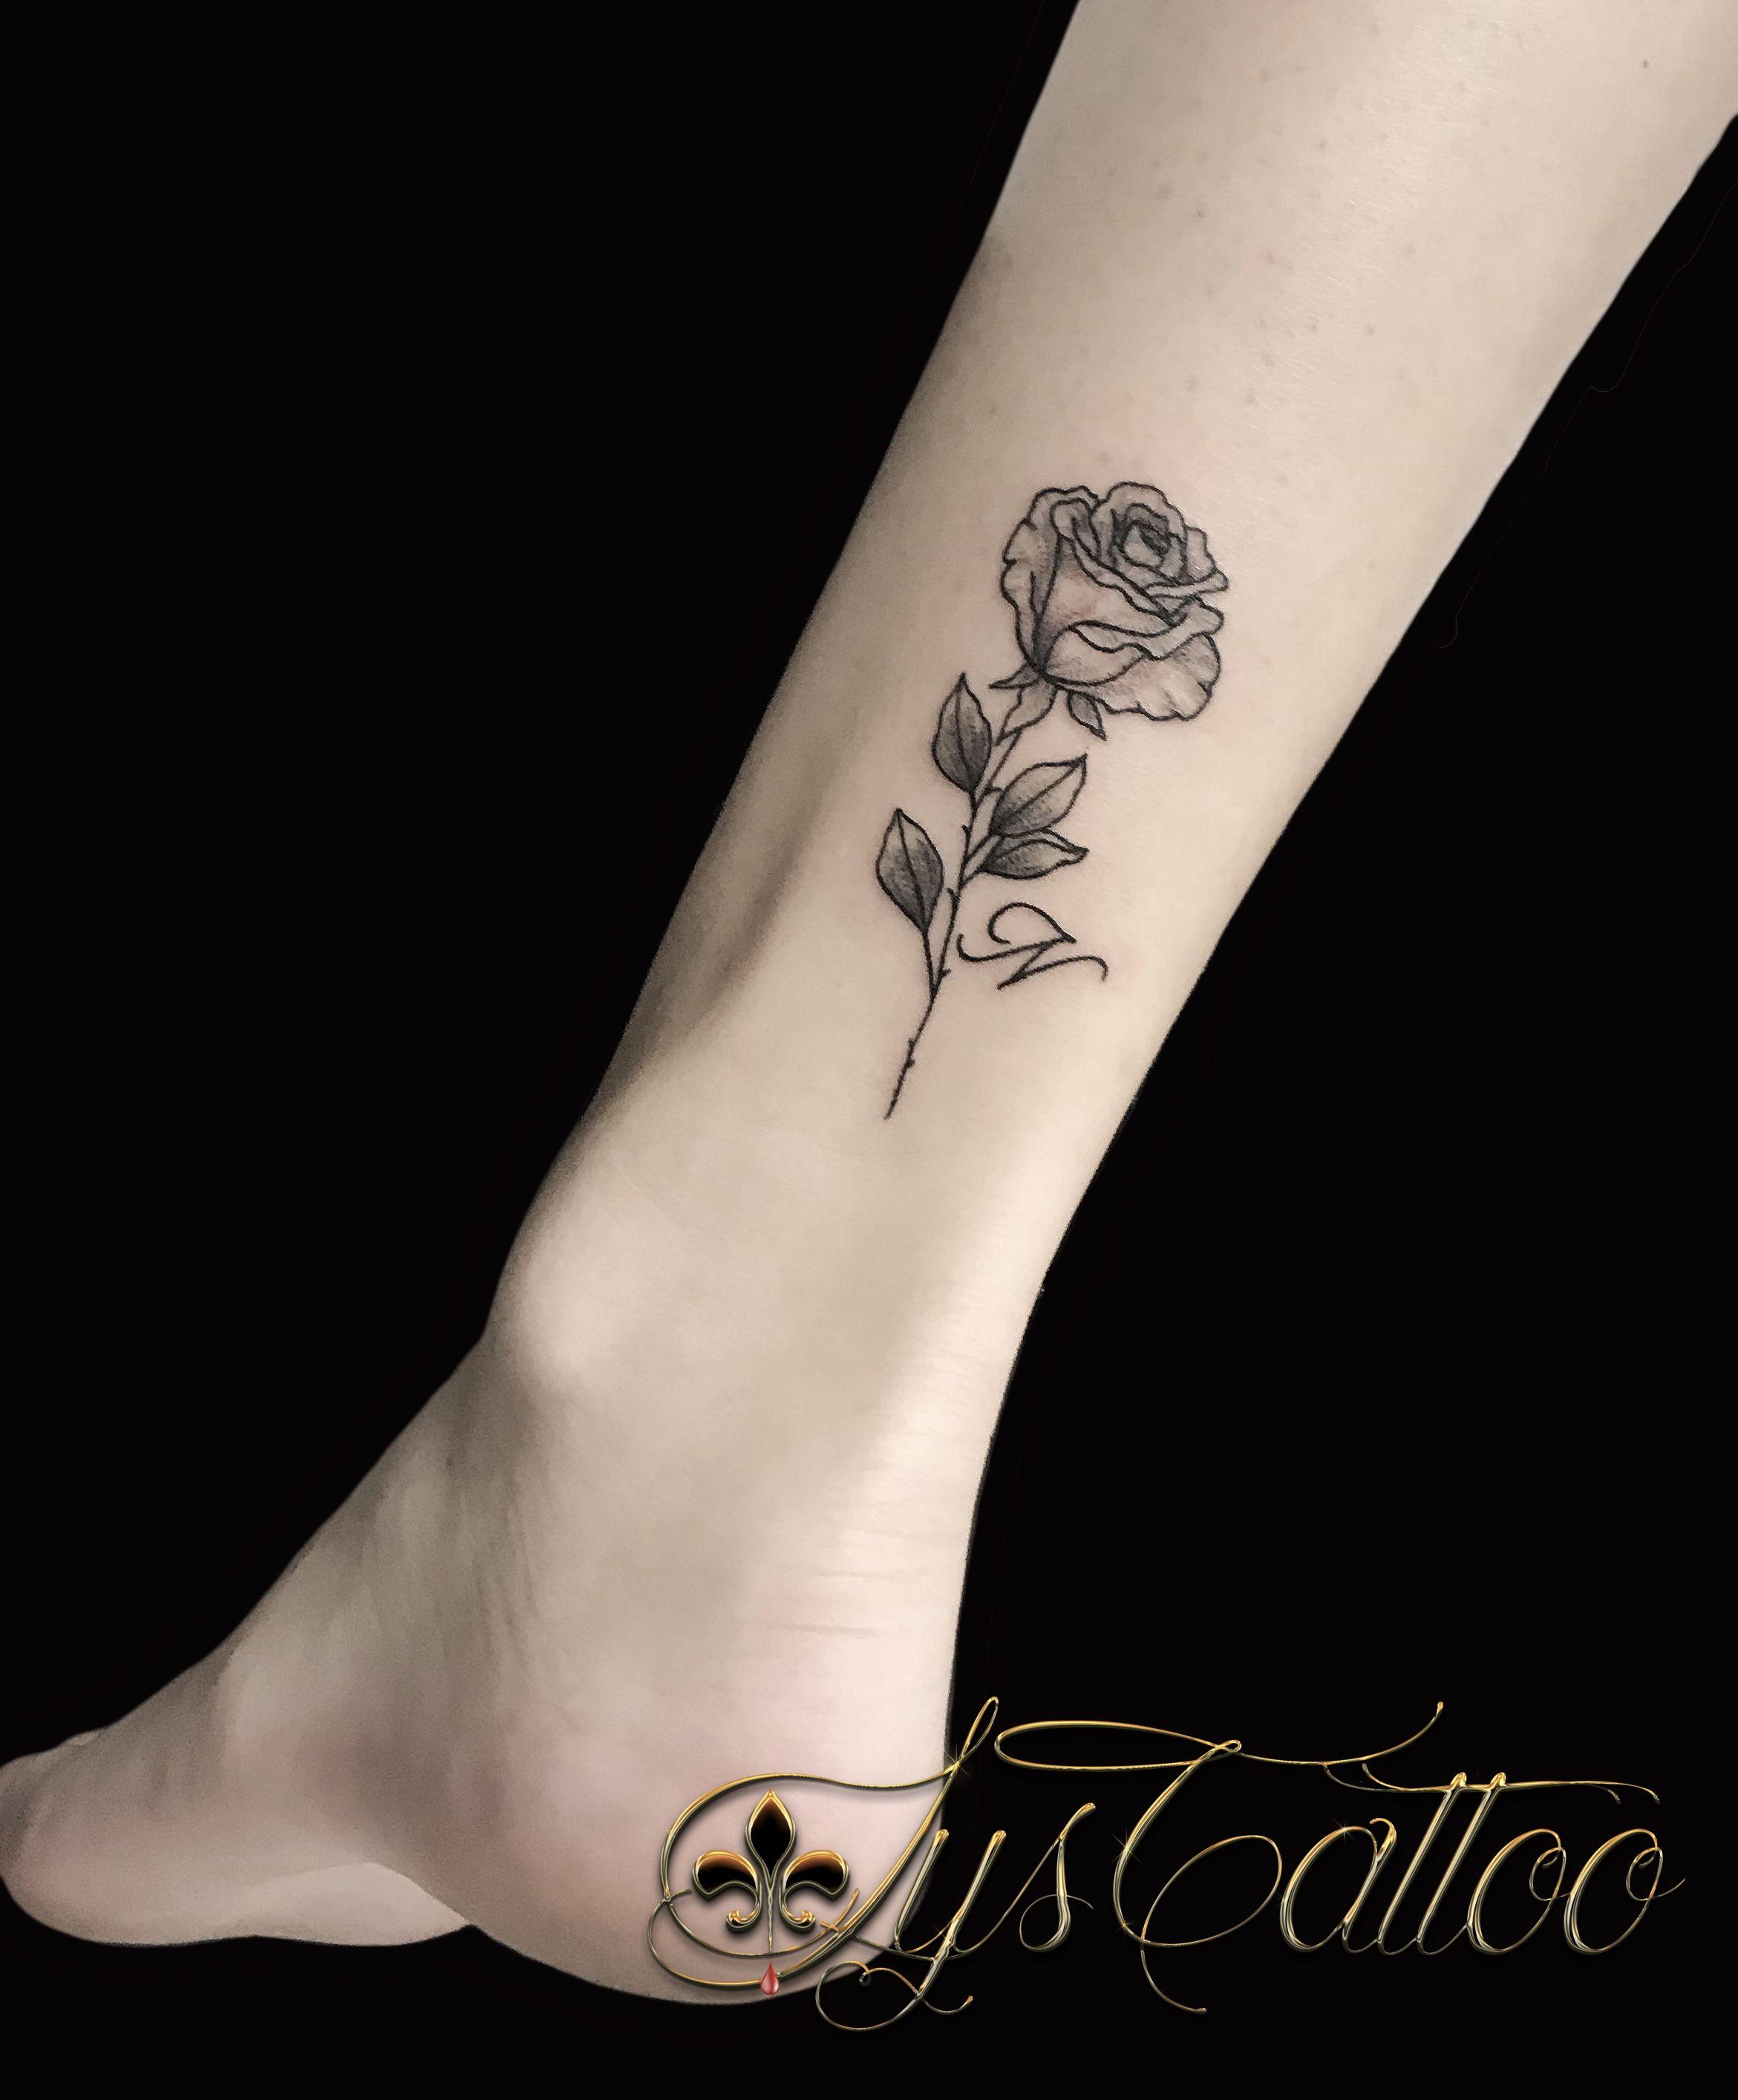 Tatouage Cheville Fleur Rose Et Initiale N Feminin Discret Fin